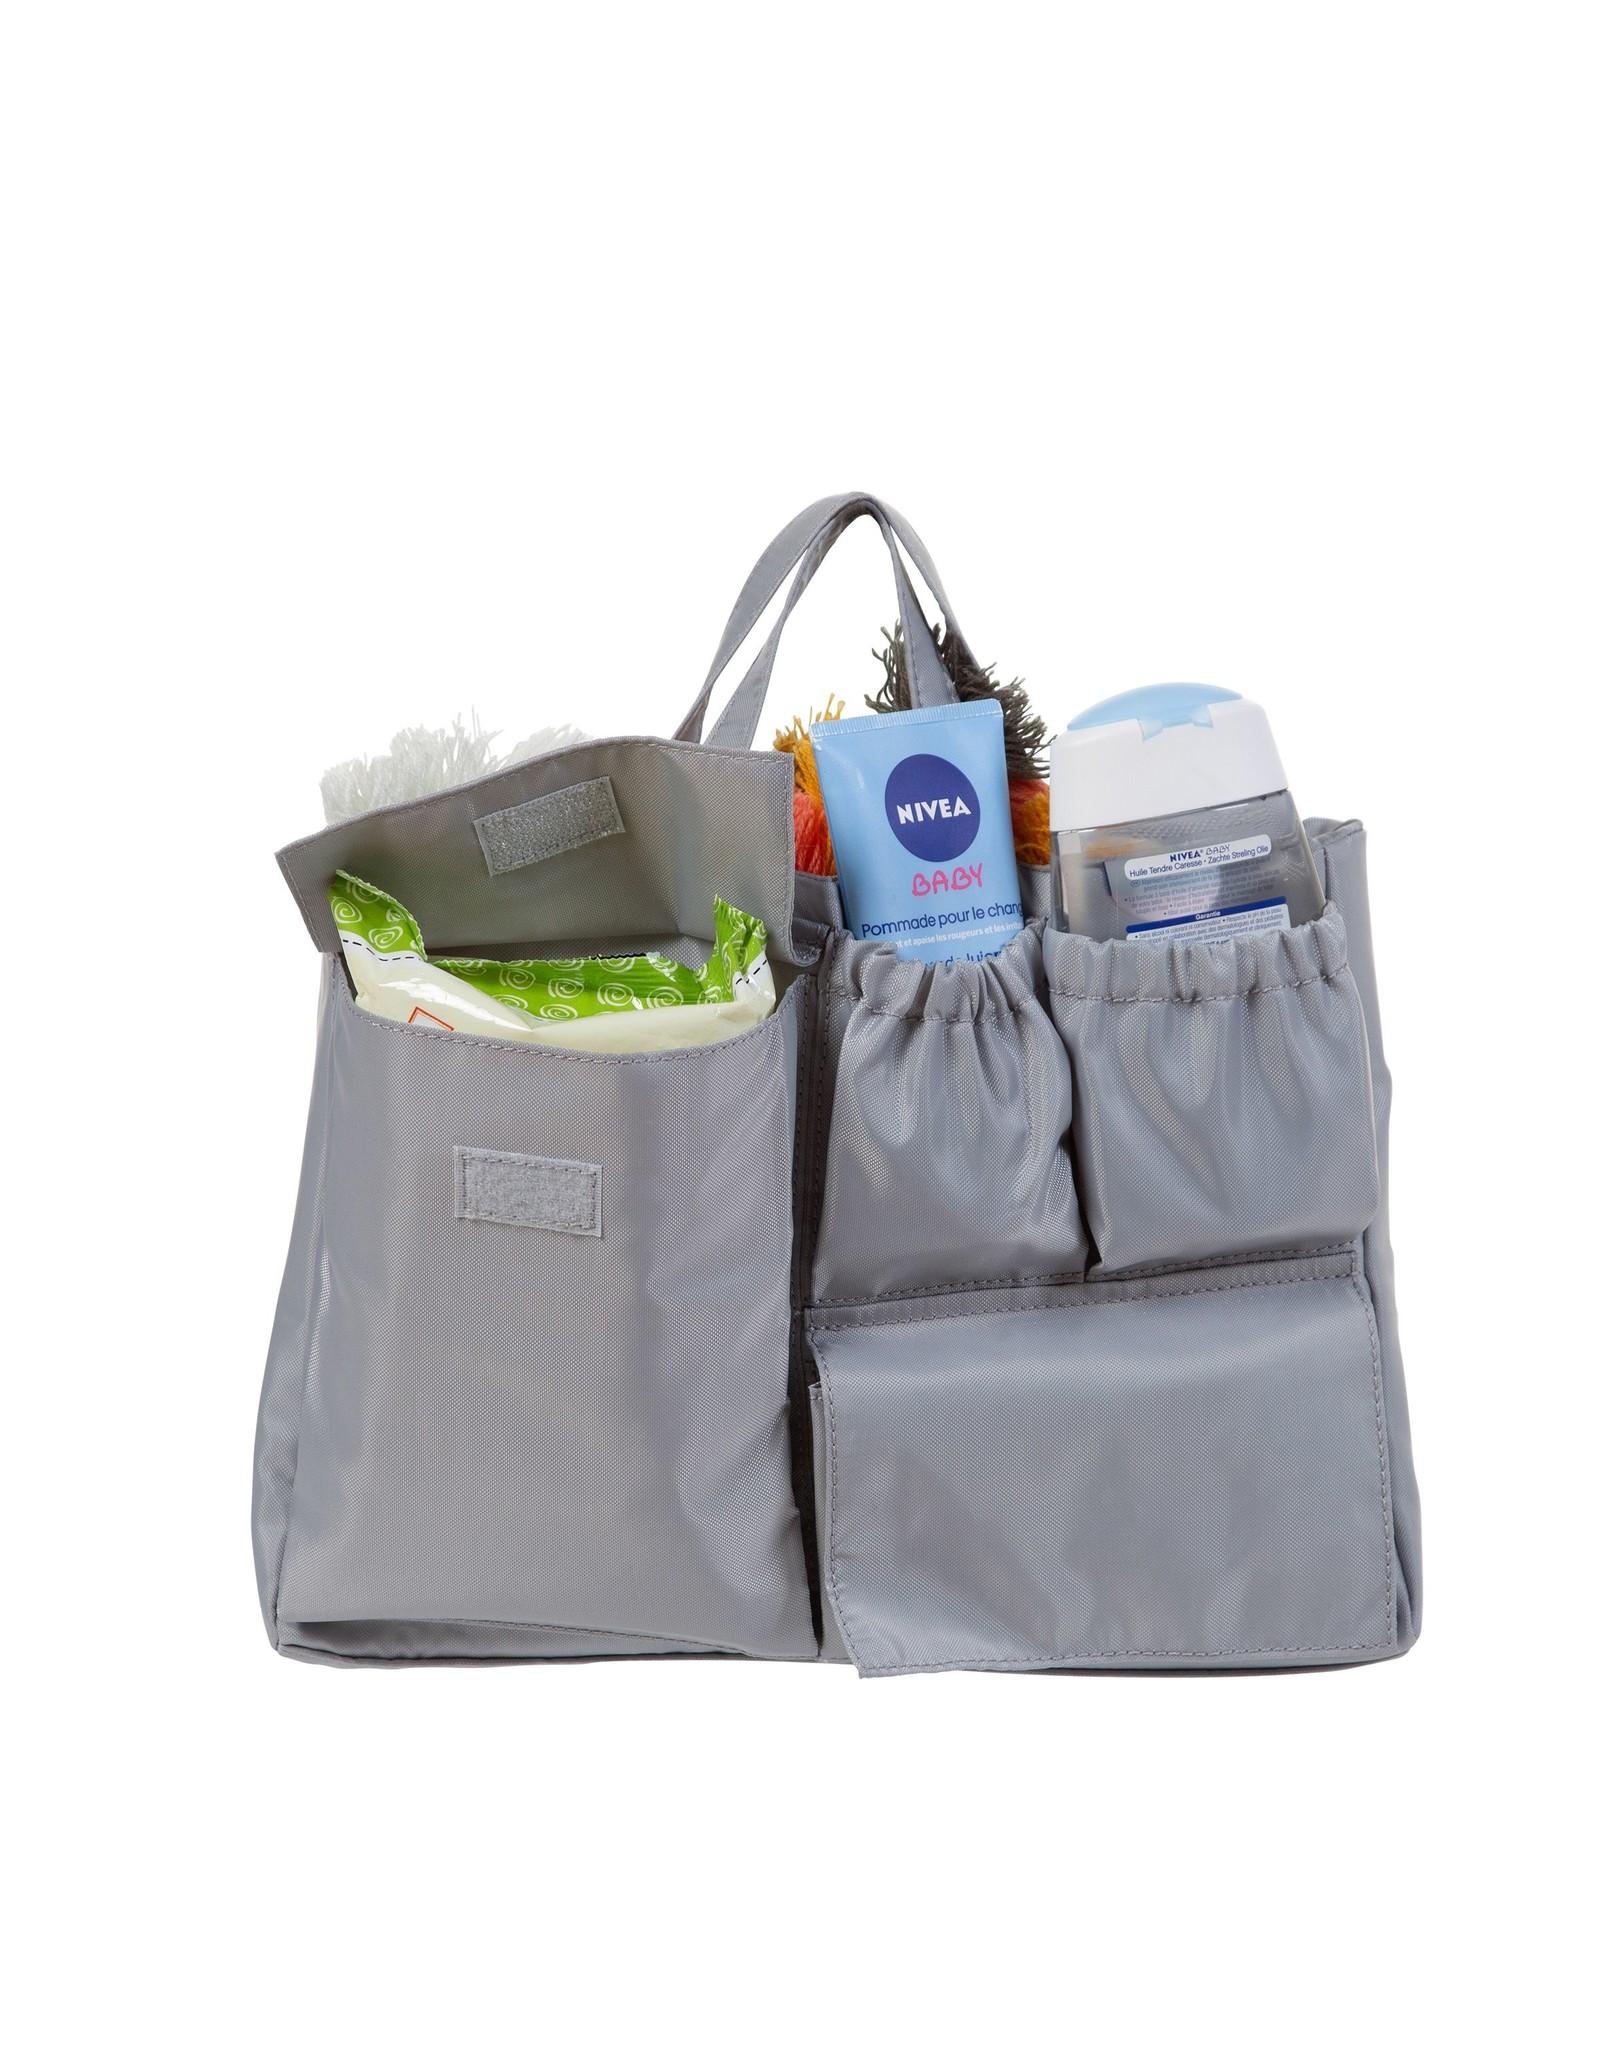 Childhome Organisateur pour Family bag